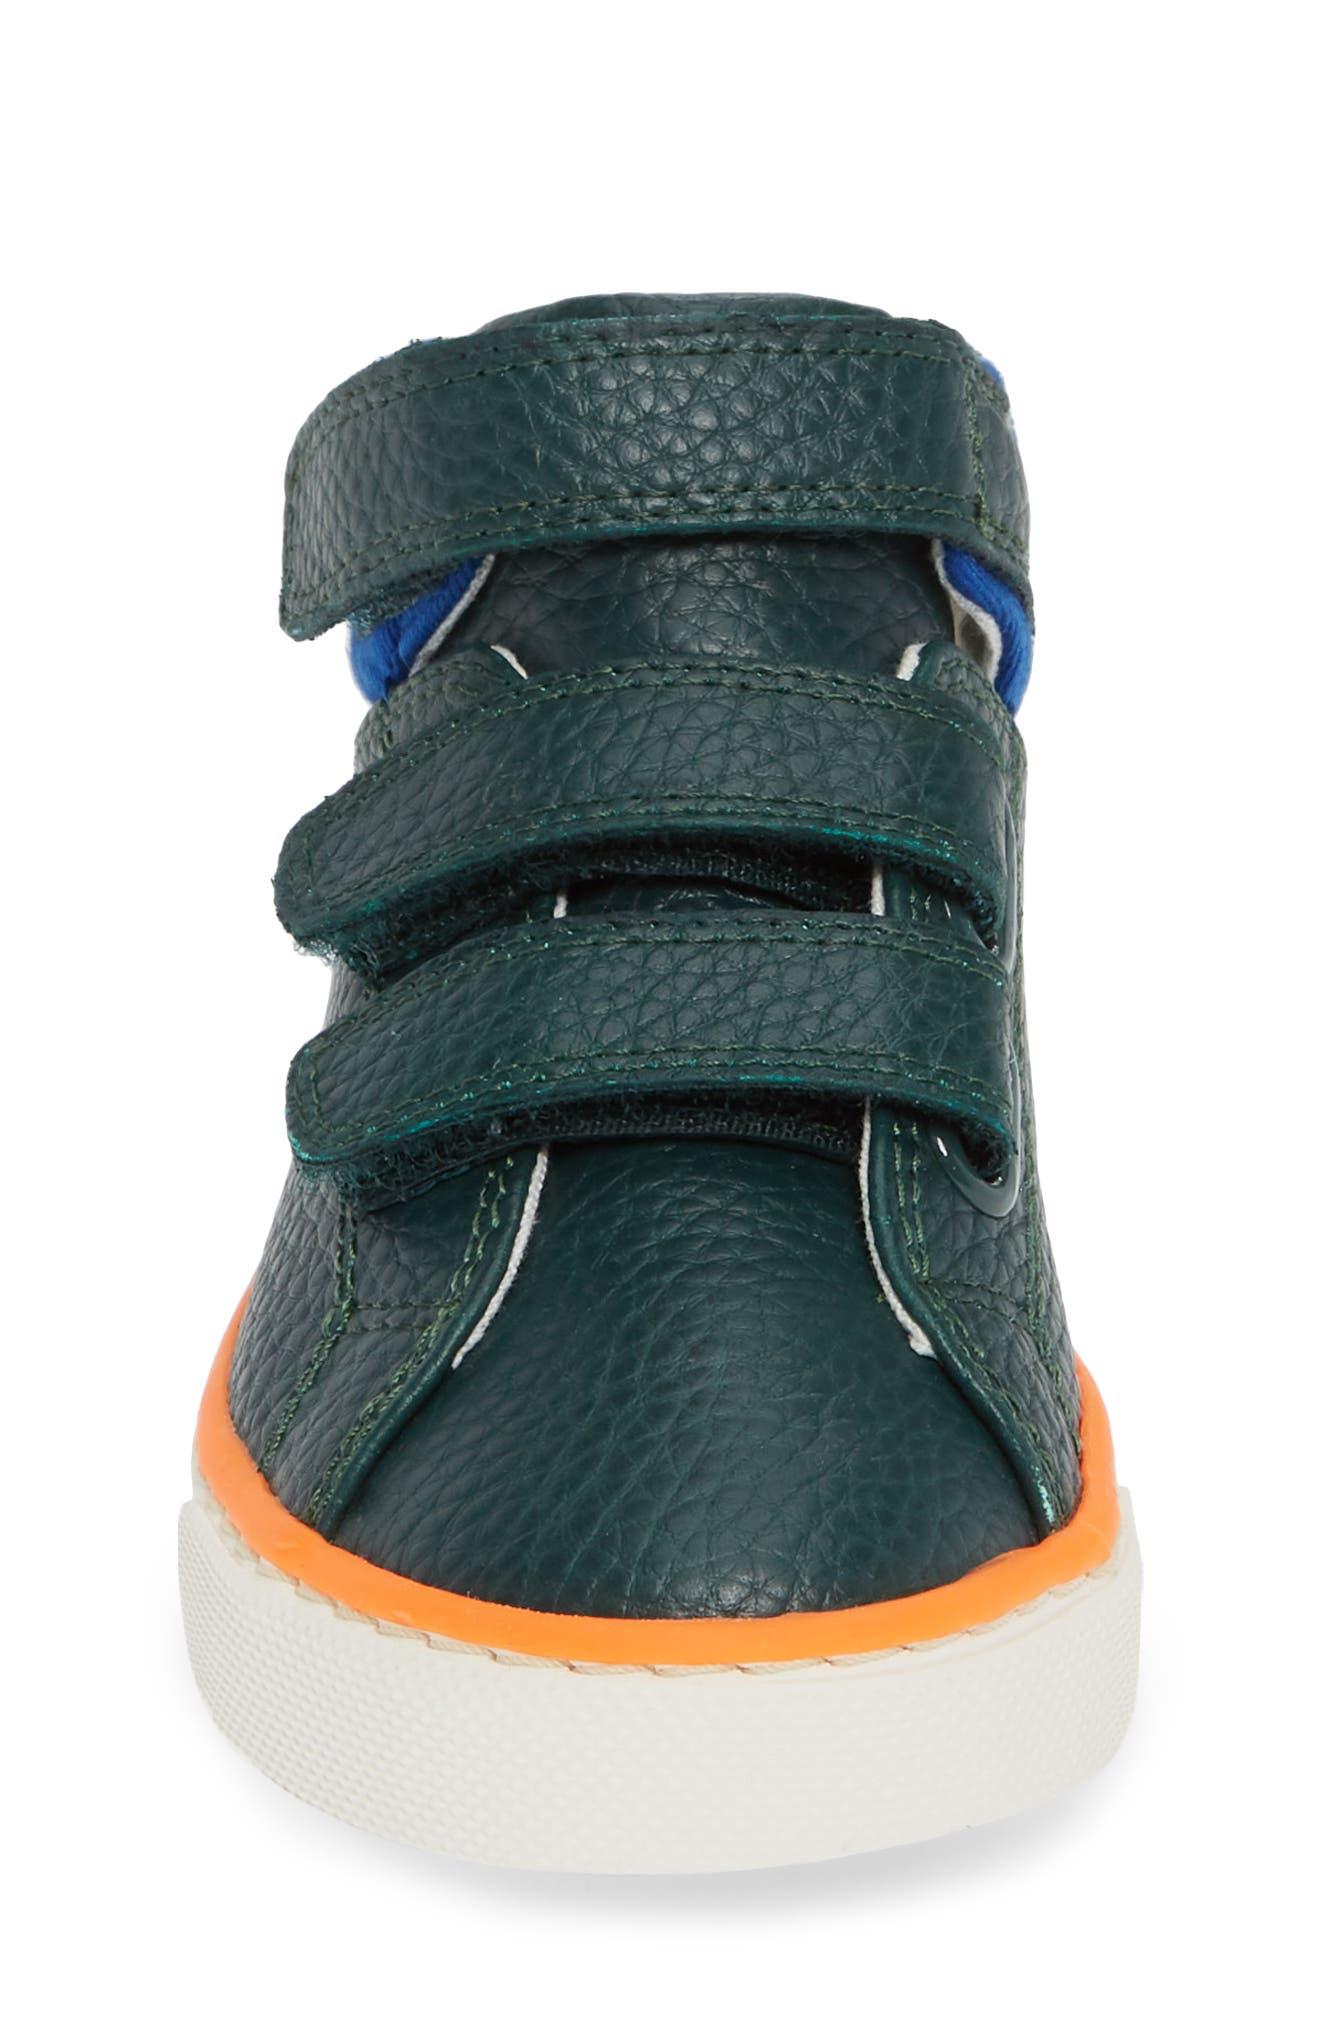 High Top Sneaker,                             Alternate thumbnail 4, color,                             SCOTTS PINE GREEN